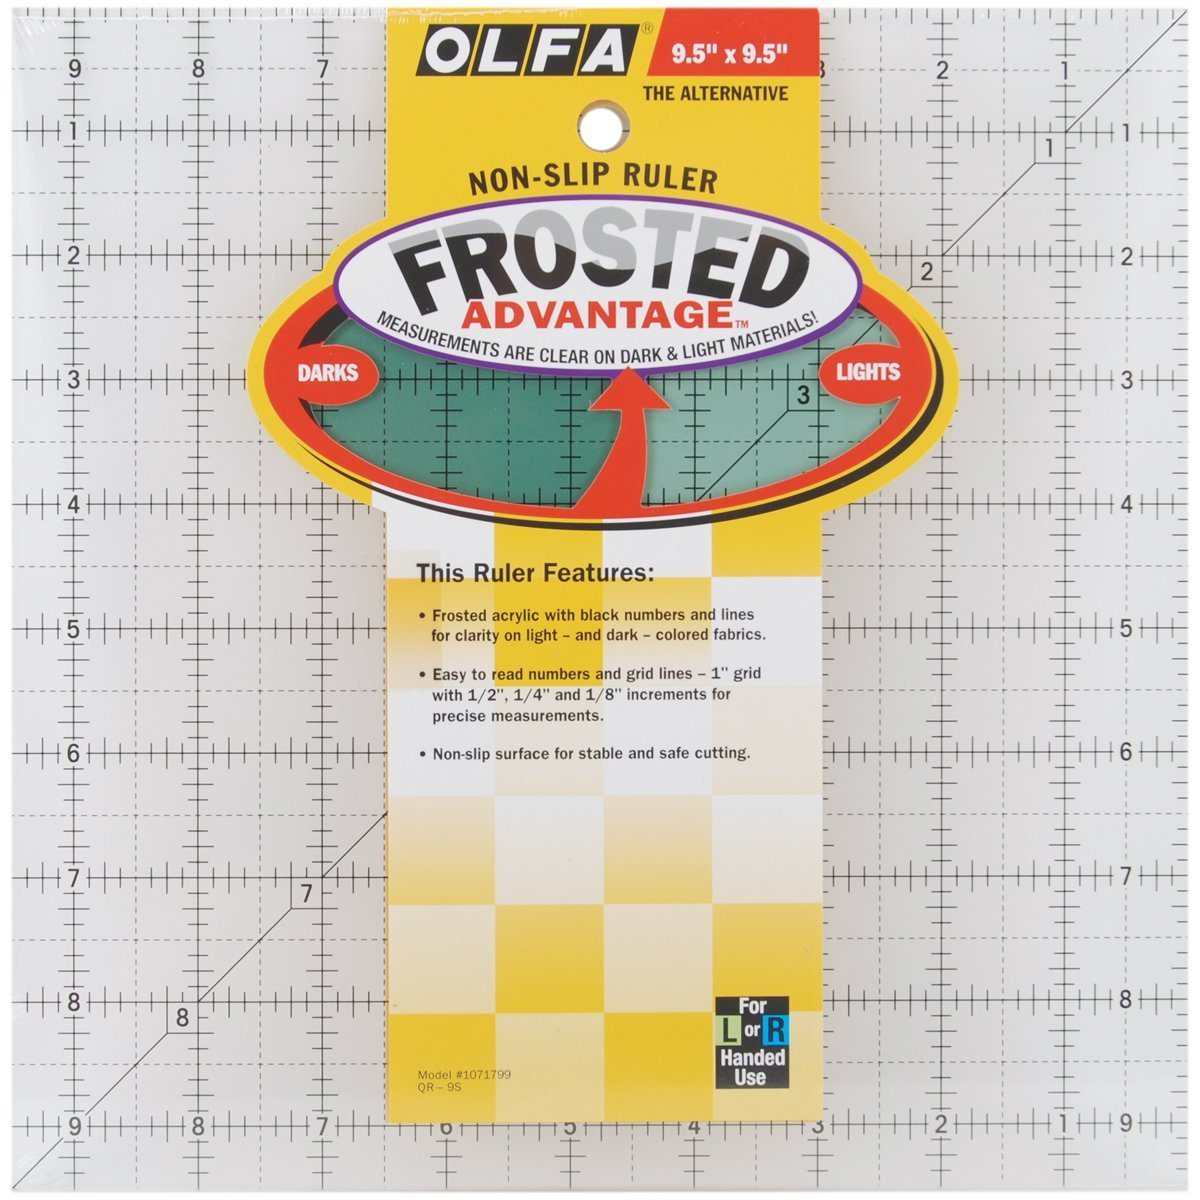 Olfa ruler